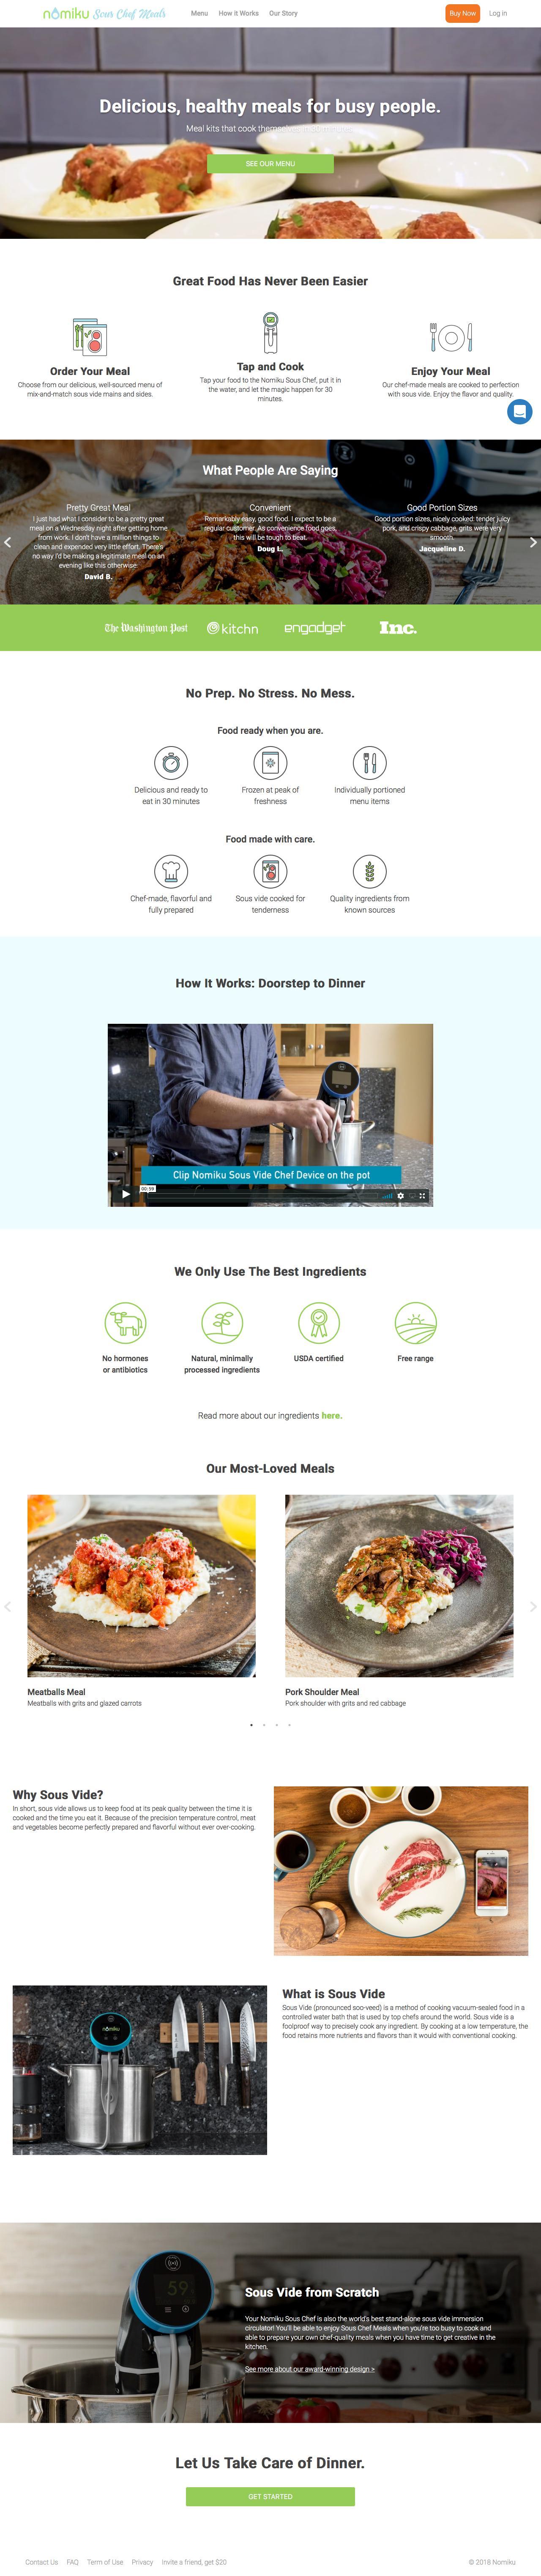 Screenshot of nomiku.com - Nomiku Sous Chef Meals - captured June 27, 2018